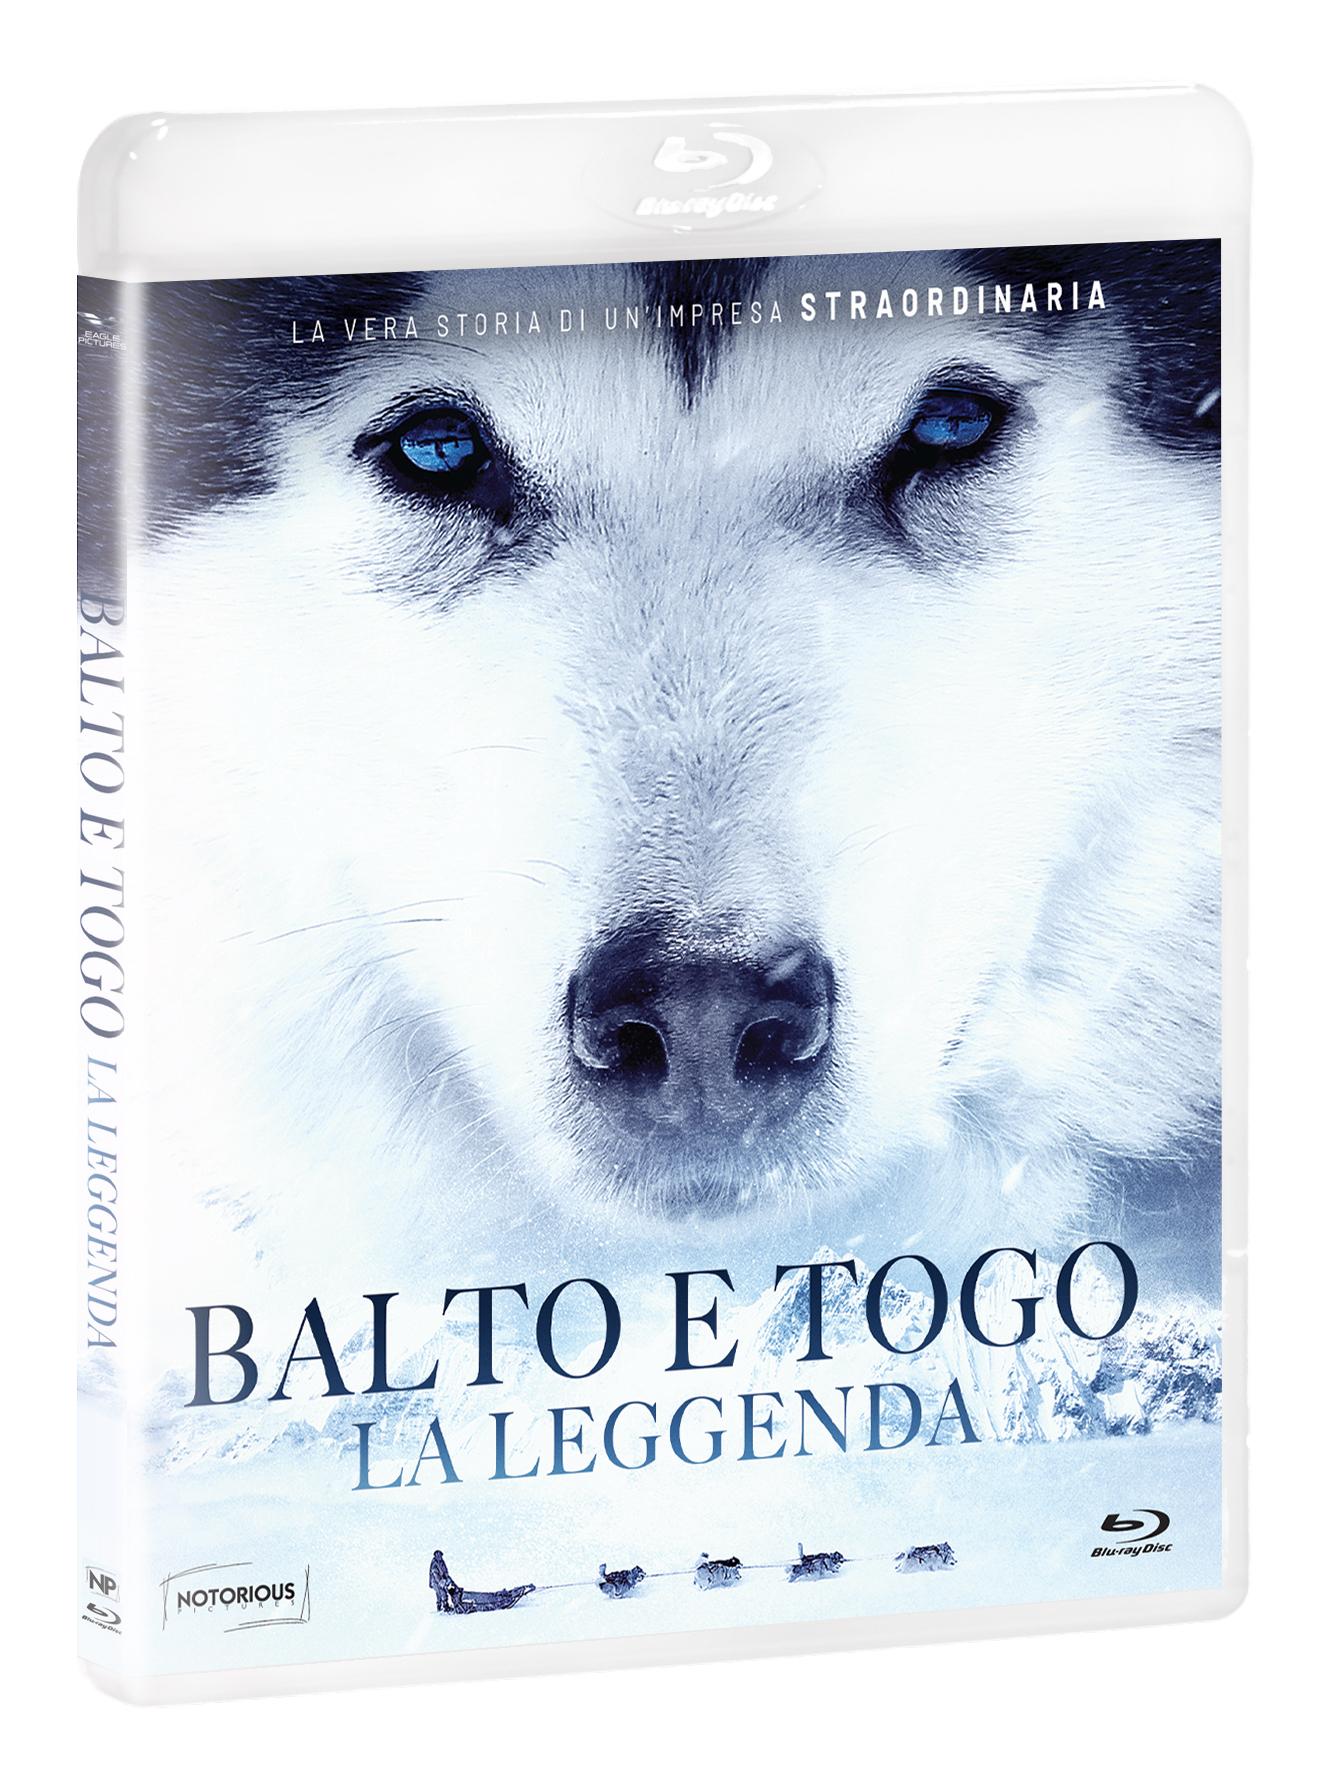 BALTO E TOGO - LA LEGGENDA - BLU RAY